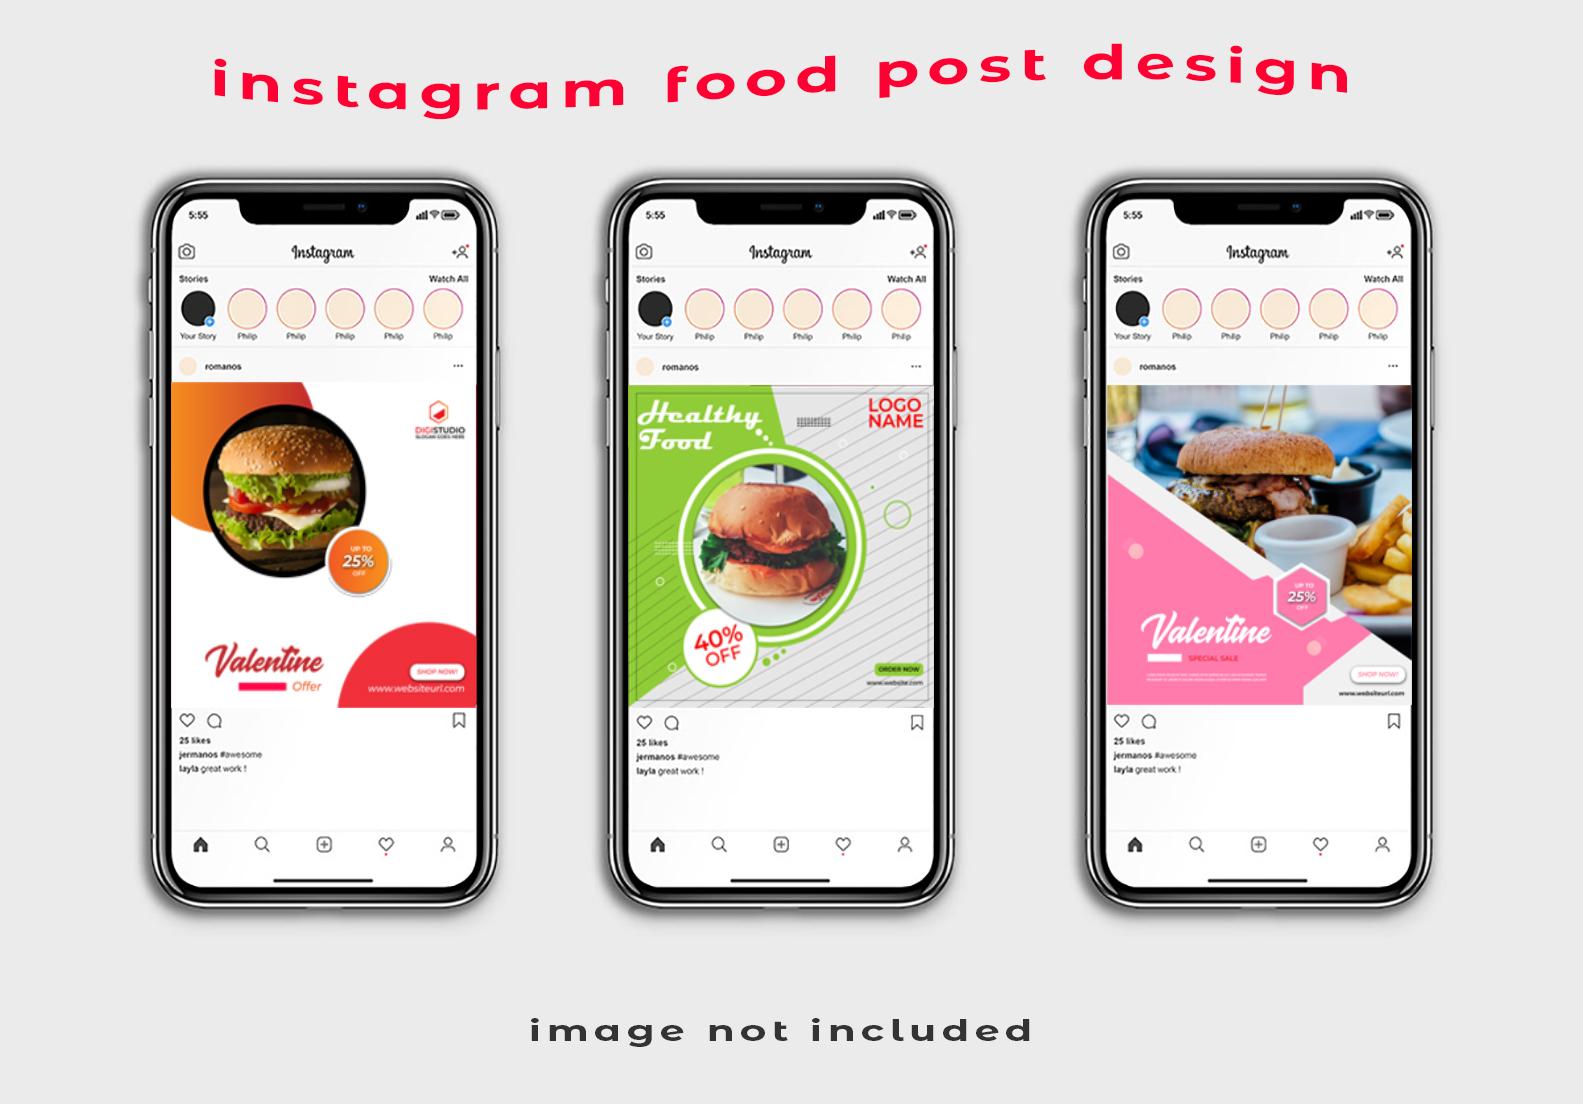 I will design professional Instagram food post design